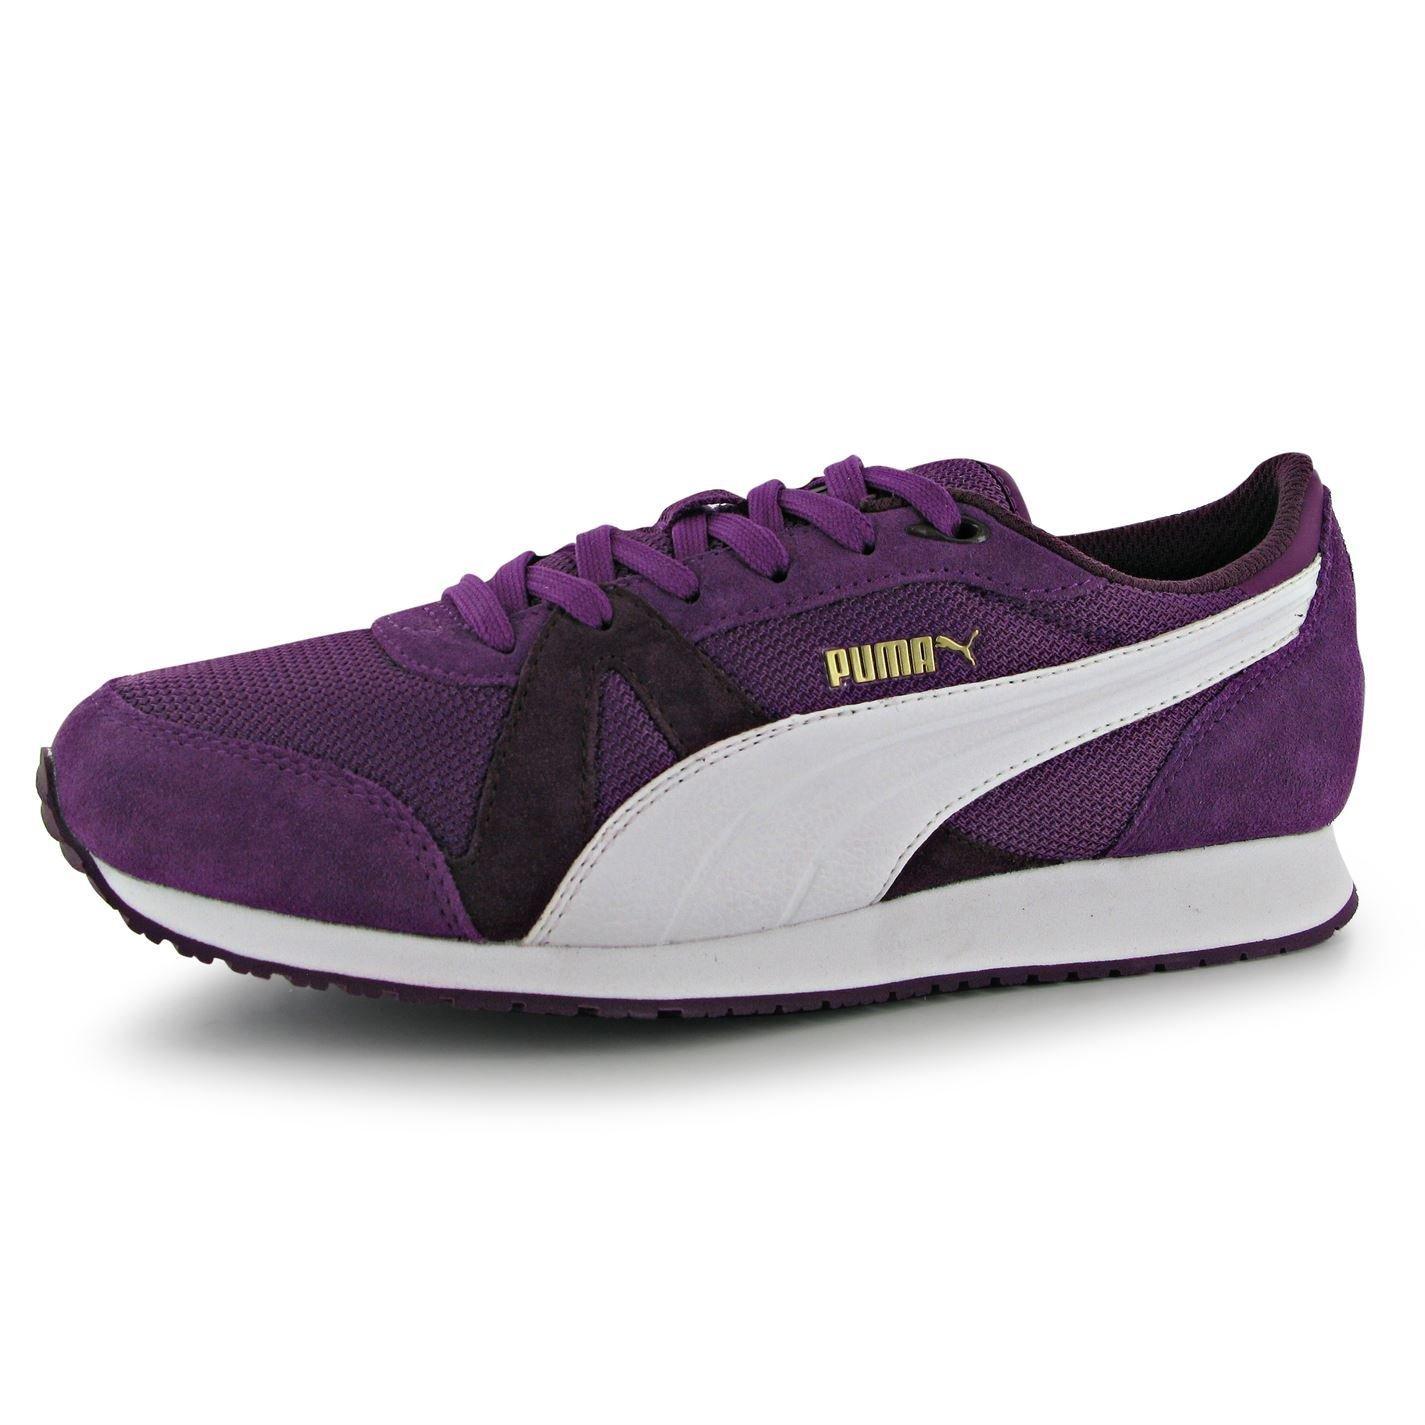 Puma TF Racer Mesh Damen Turnschuhe Sportschuhe Fashion Sneaker Freizeit Schuhe  7 (40.5)|Grape/White